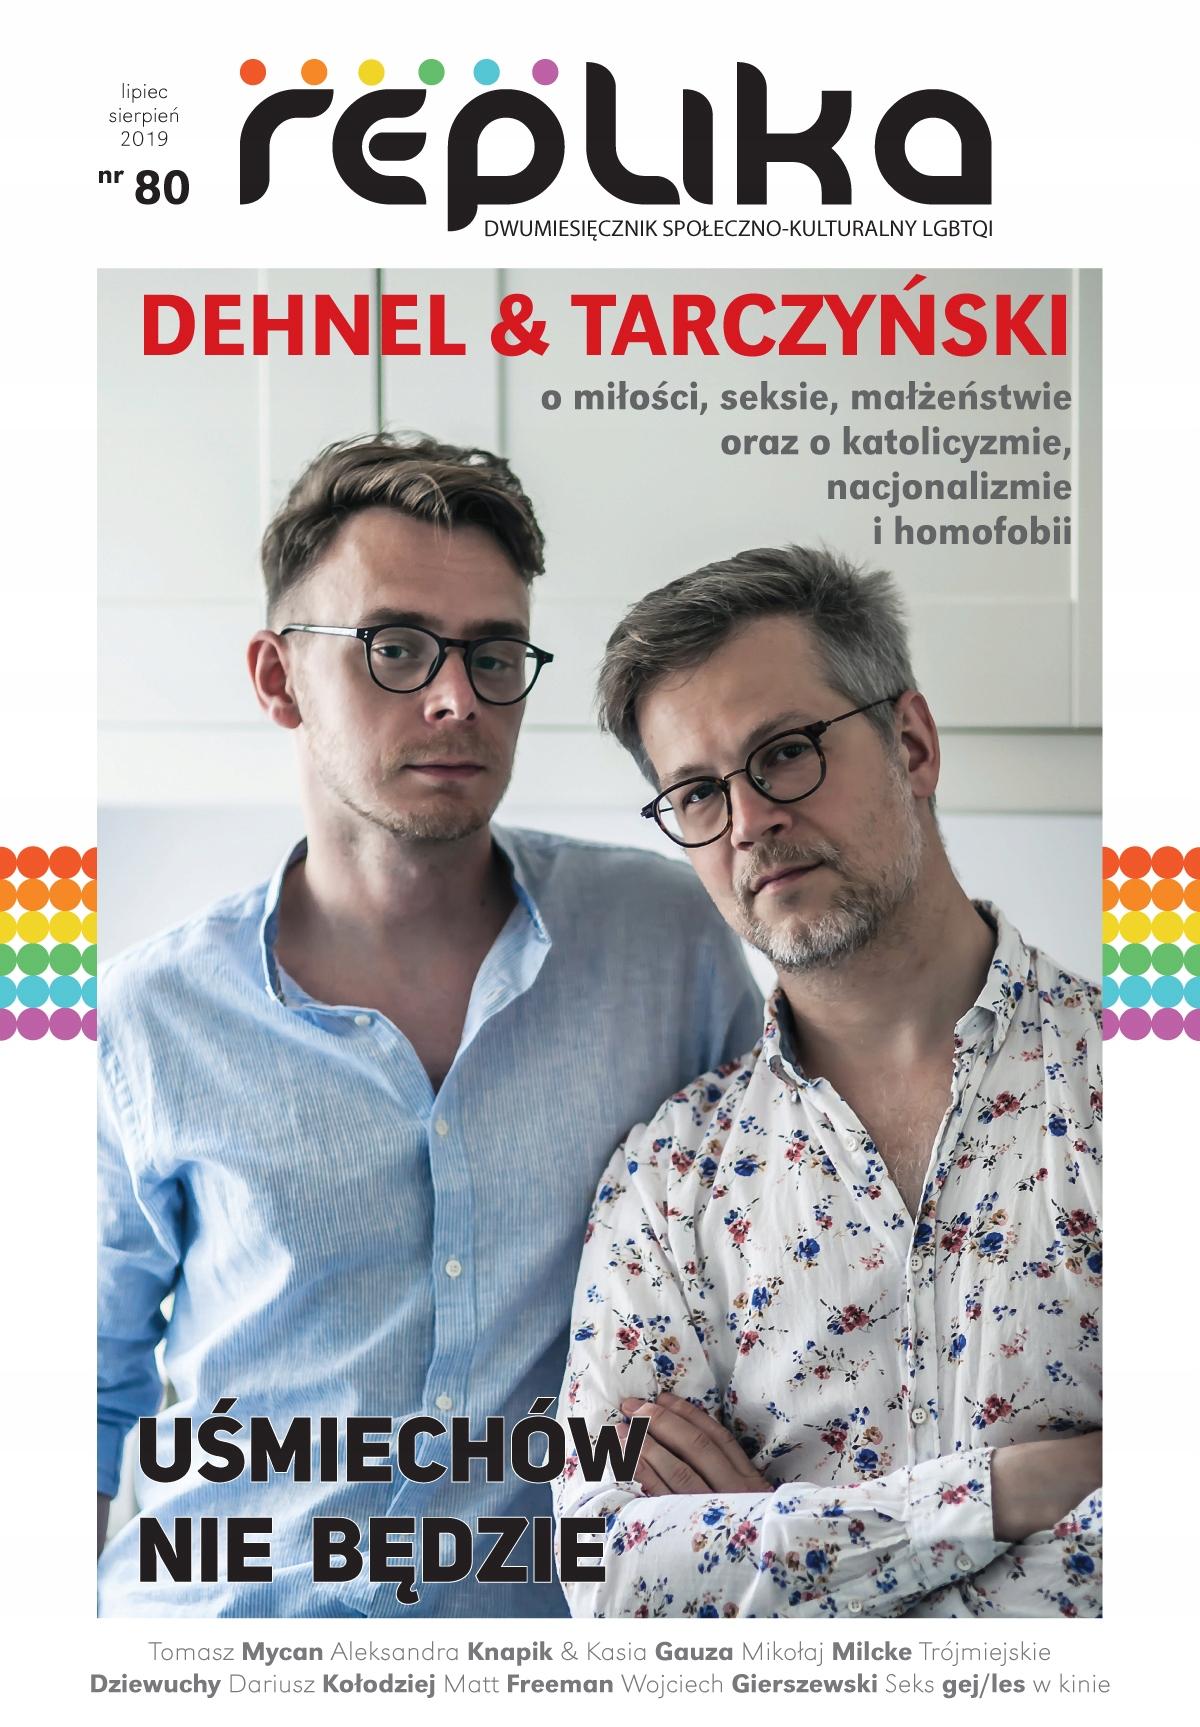 Item Remark No. 80 LGBT magazine Jul/Aug. 2019 version PDF